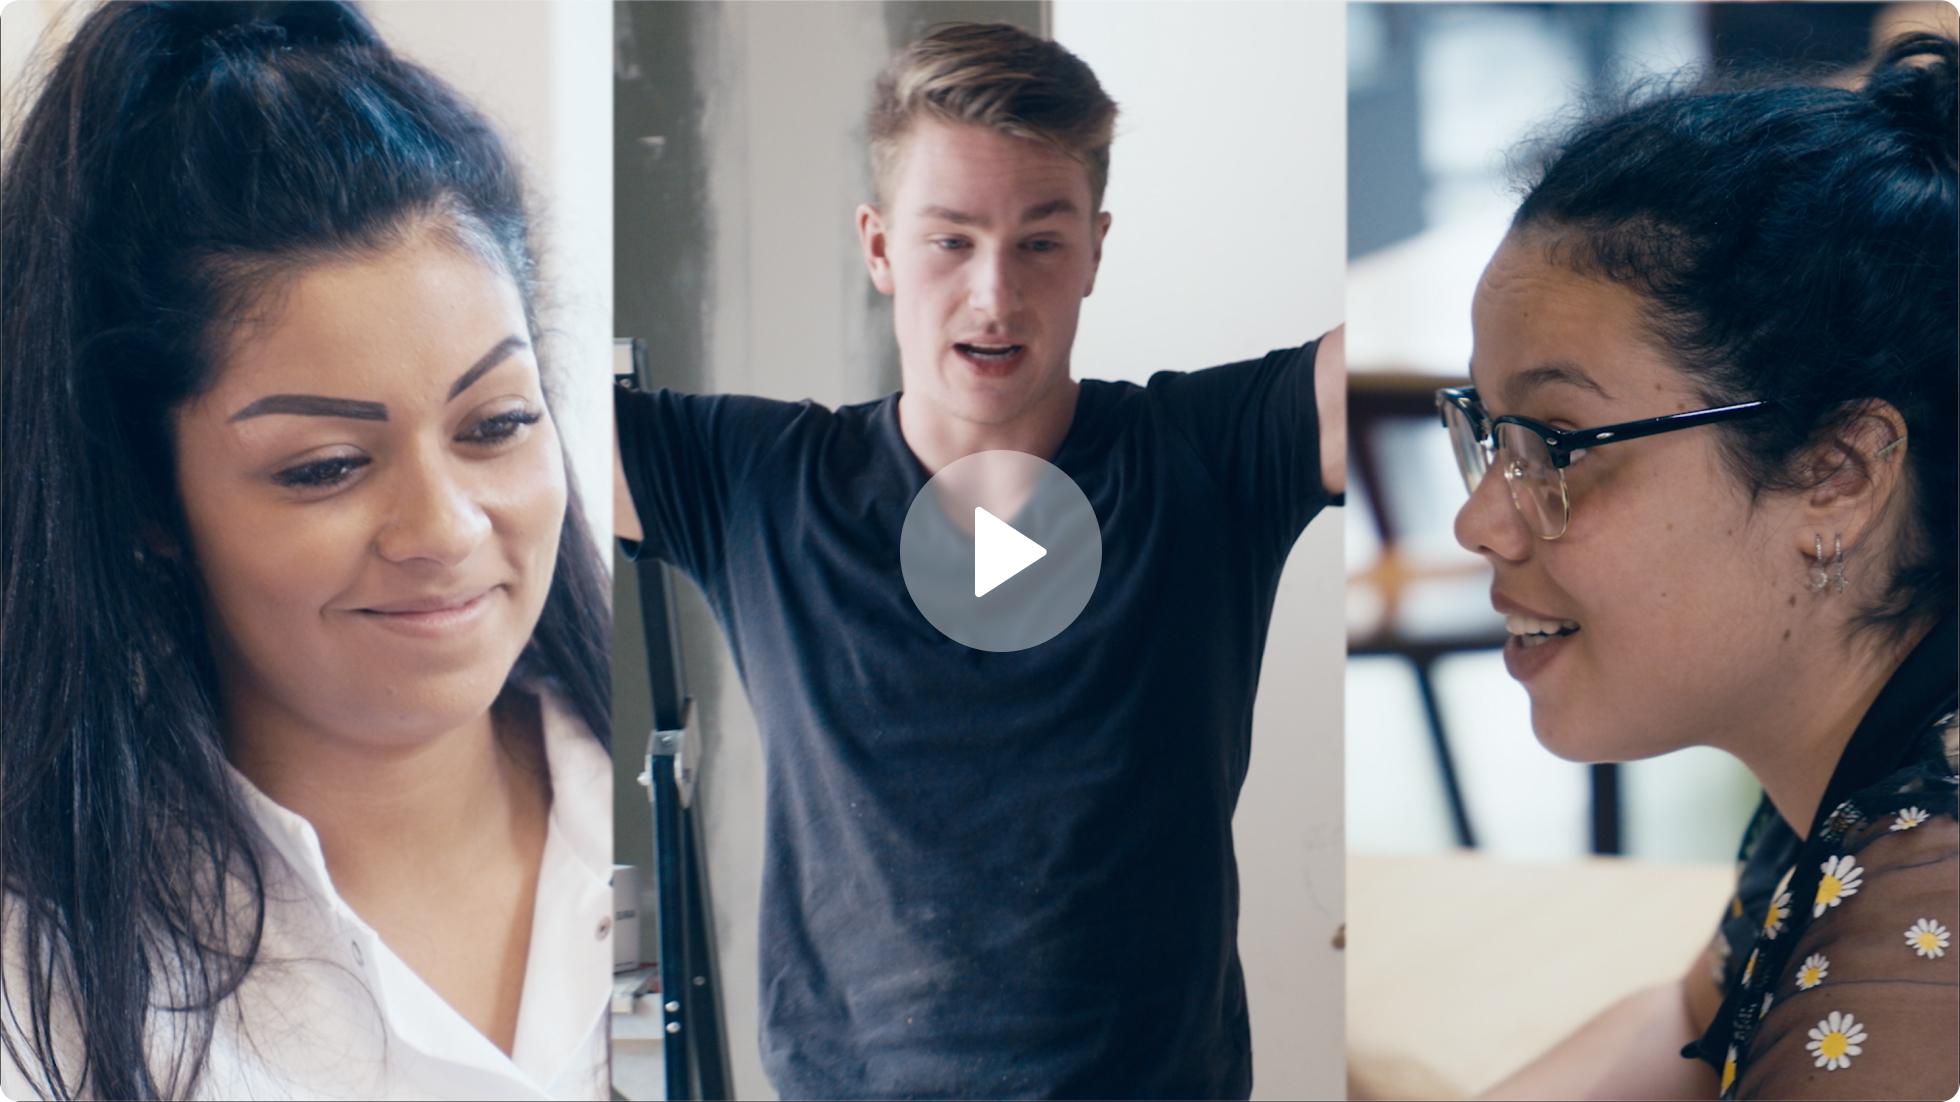 Alfa-college - Video